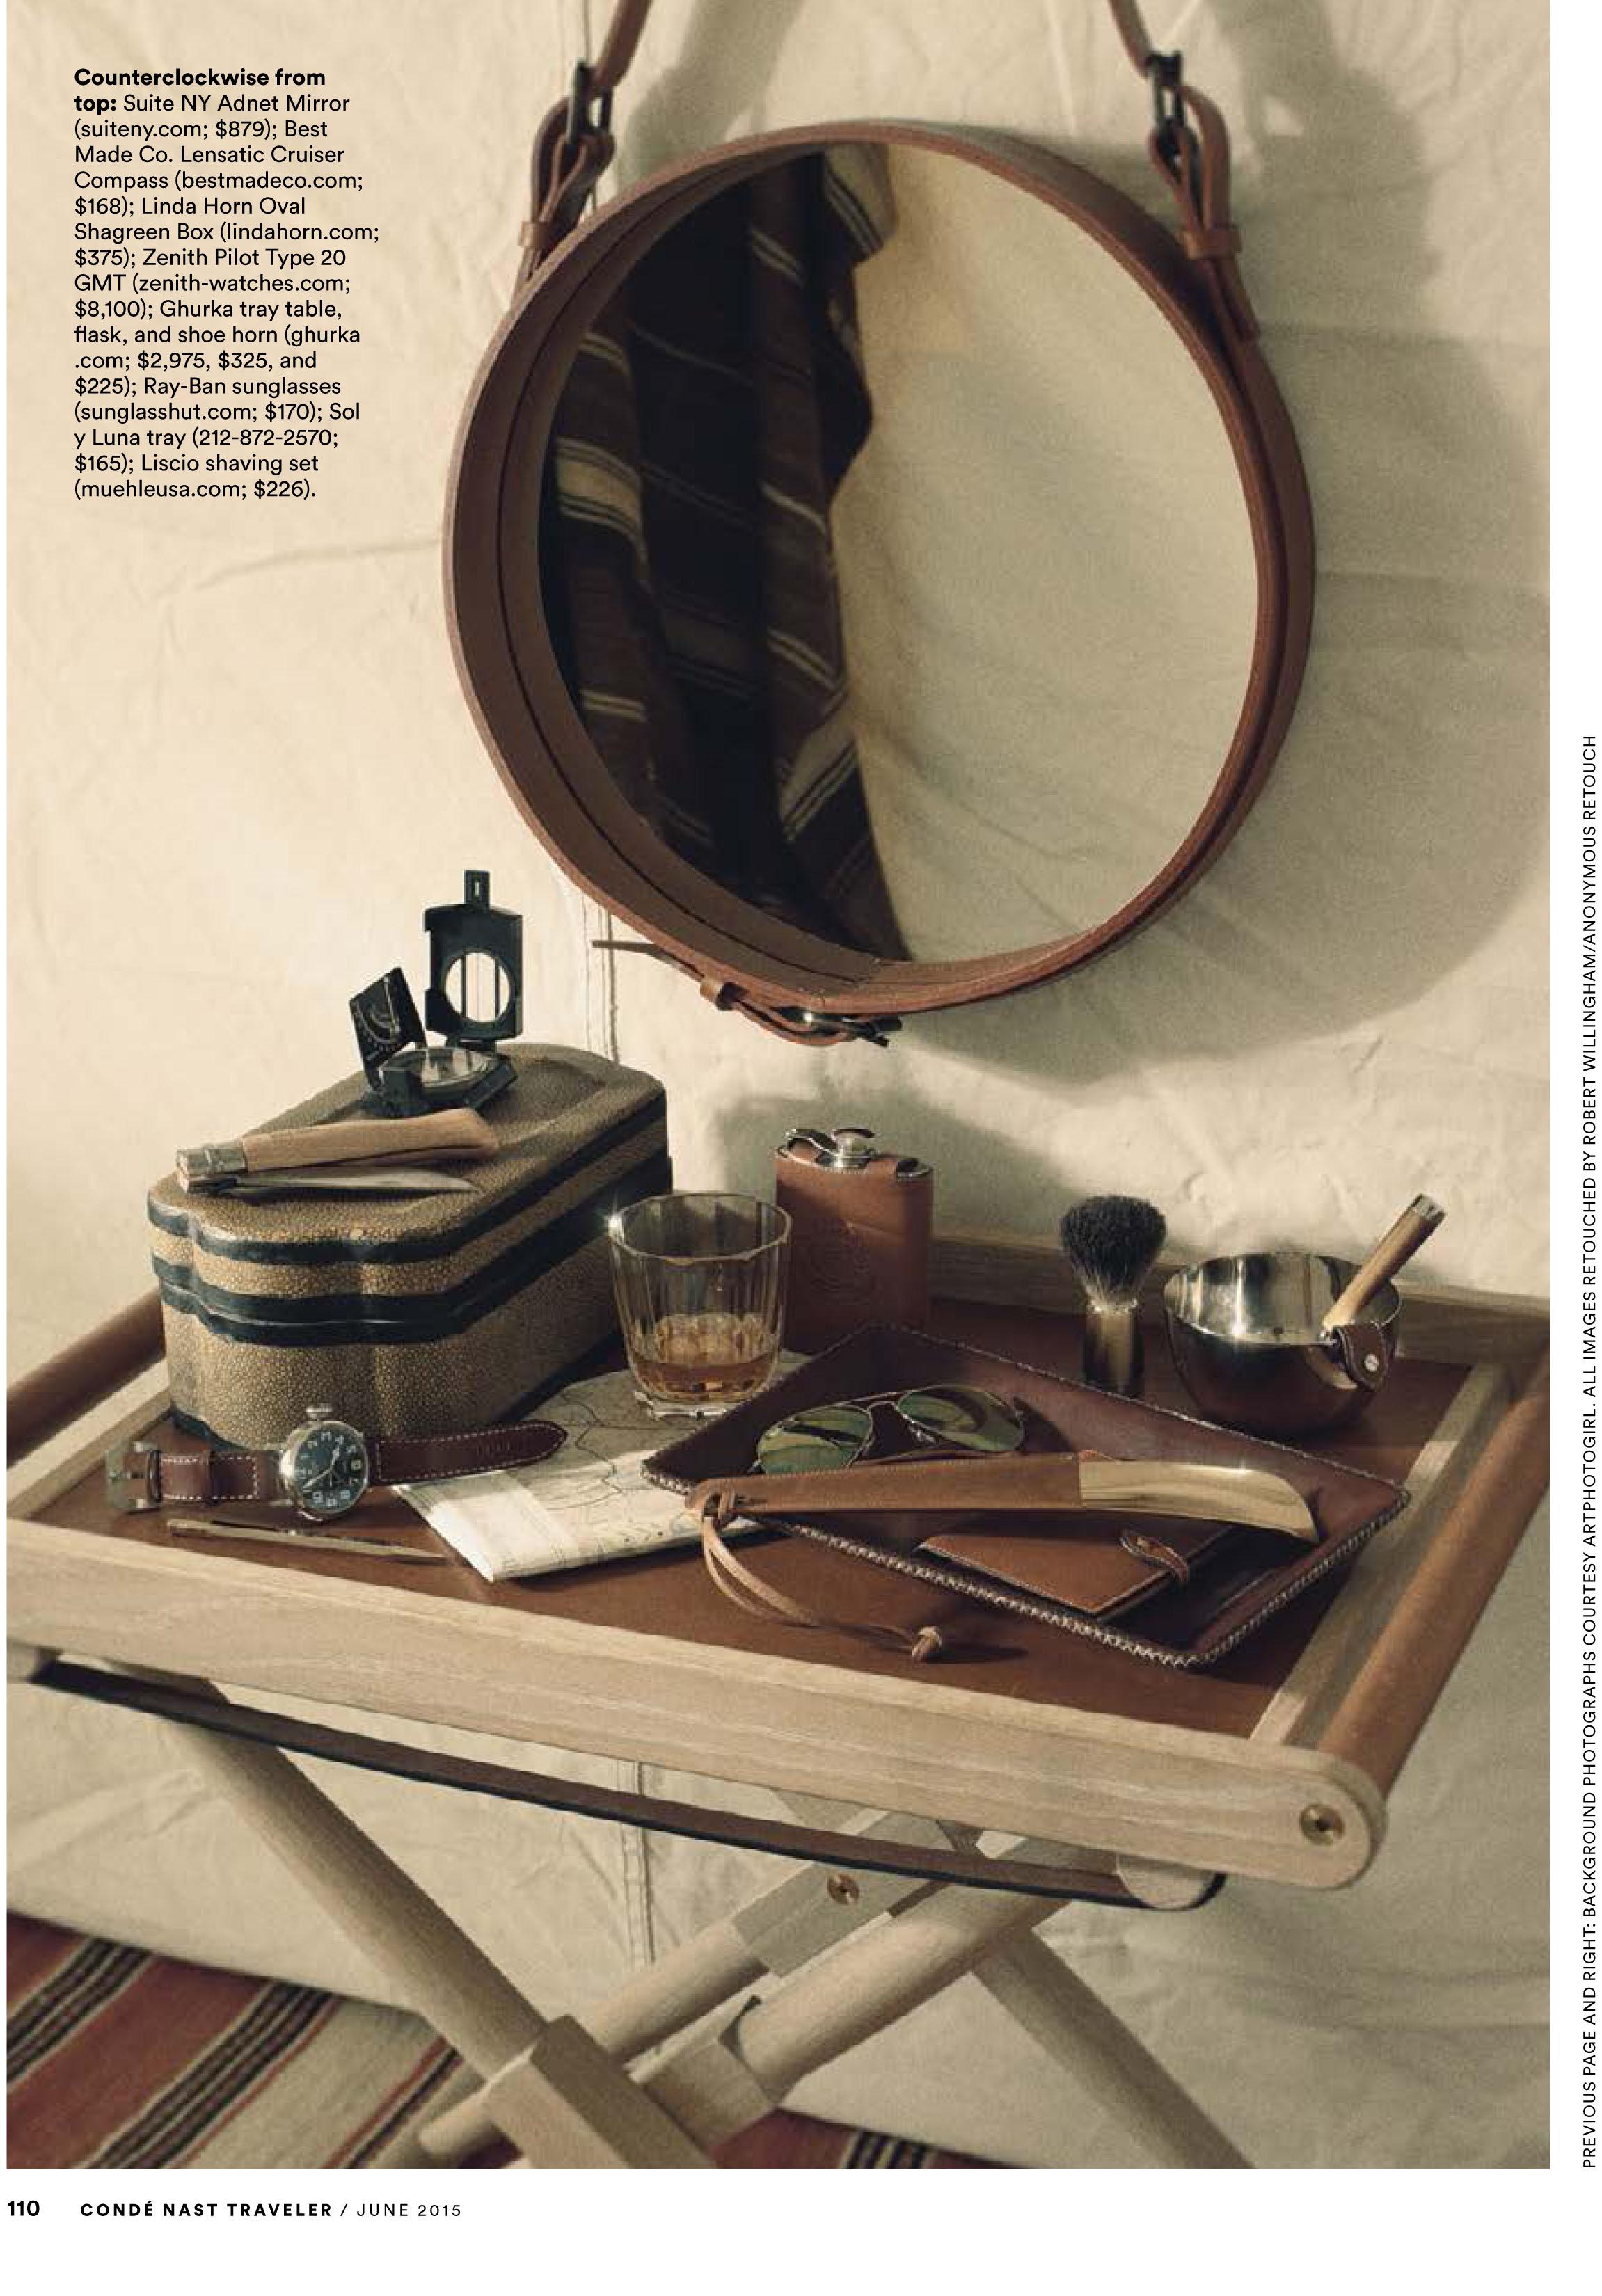 Featured: Matthiessen Tray Table